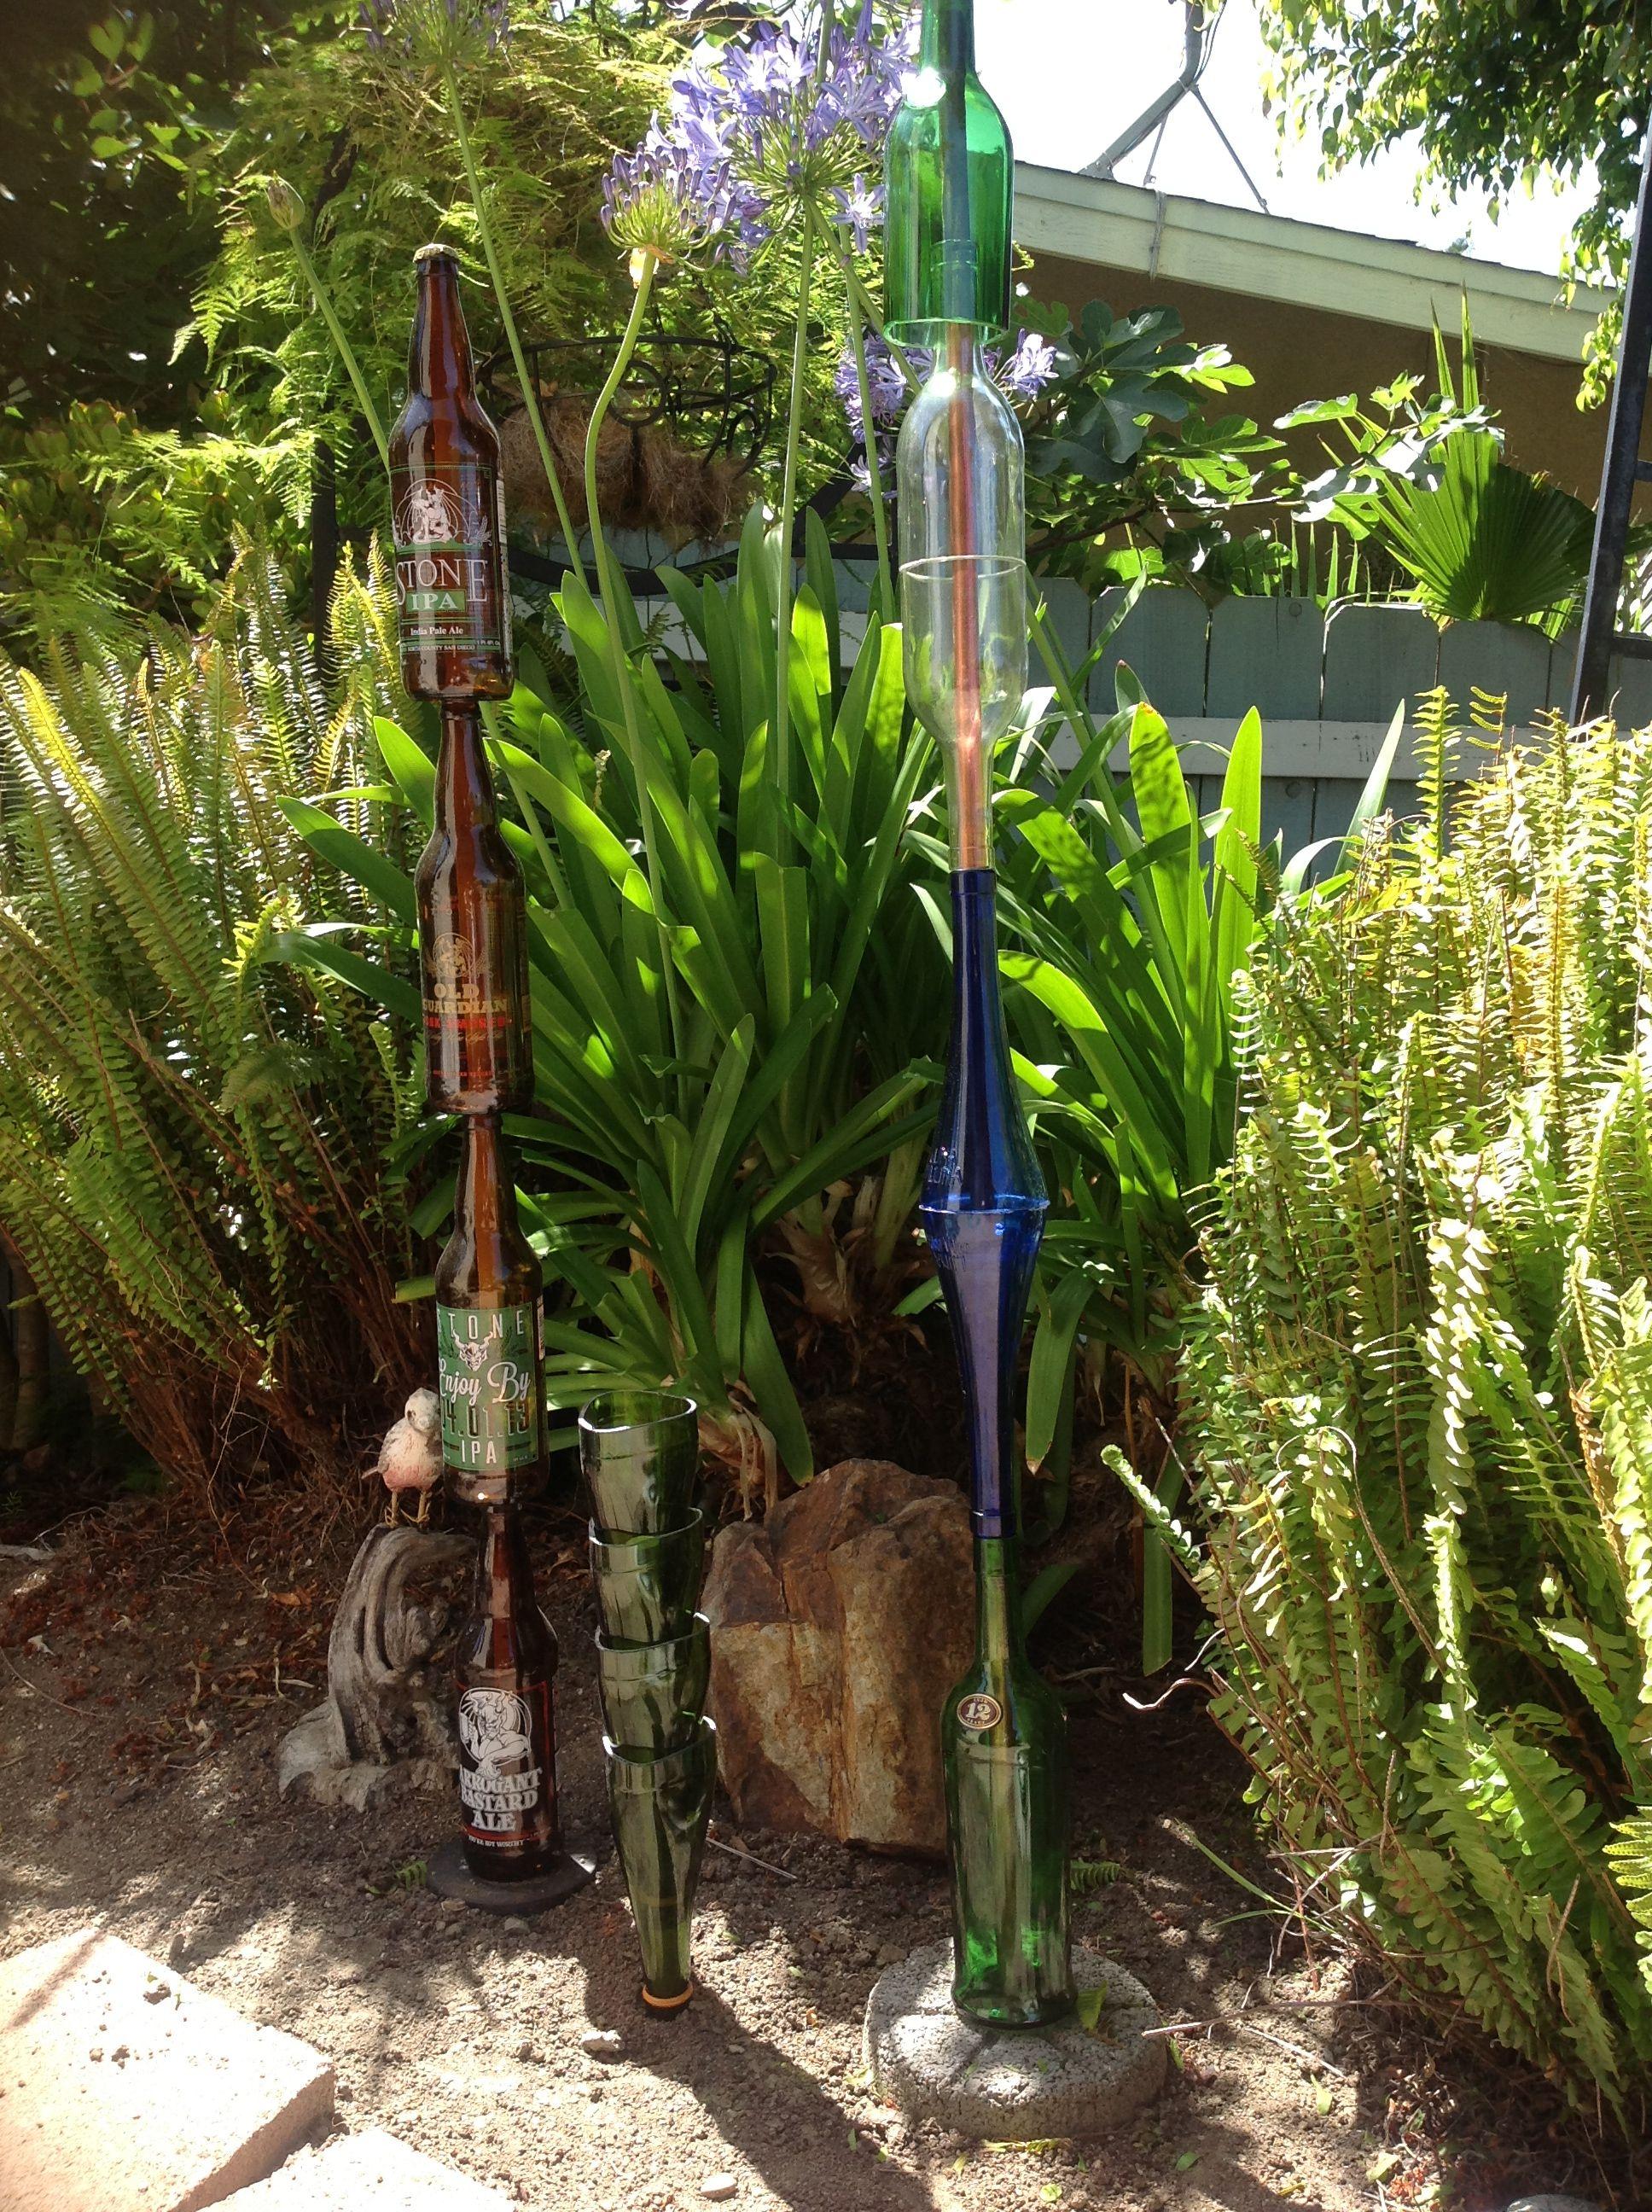 Wine Bottle - Yard Art | Bottle garden, Yard art, Wine ...